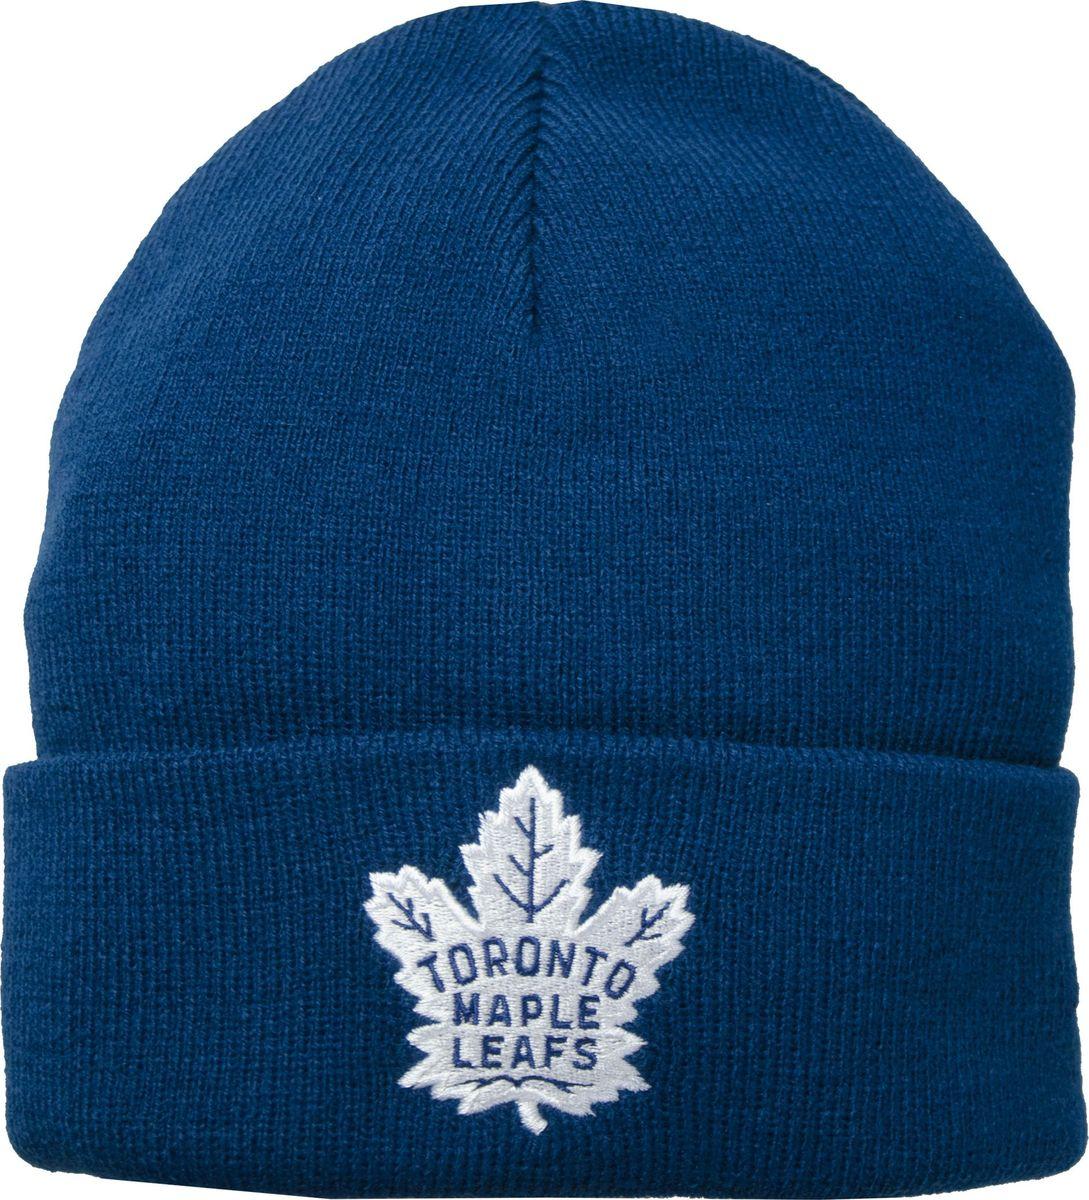 Шапка мужская Atributika & Club Toronto Maple Leafs, цвет: синий. 59032. Размер 55/5859032